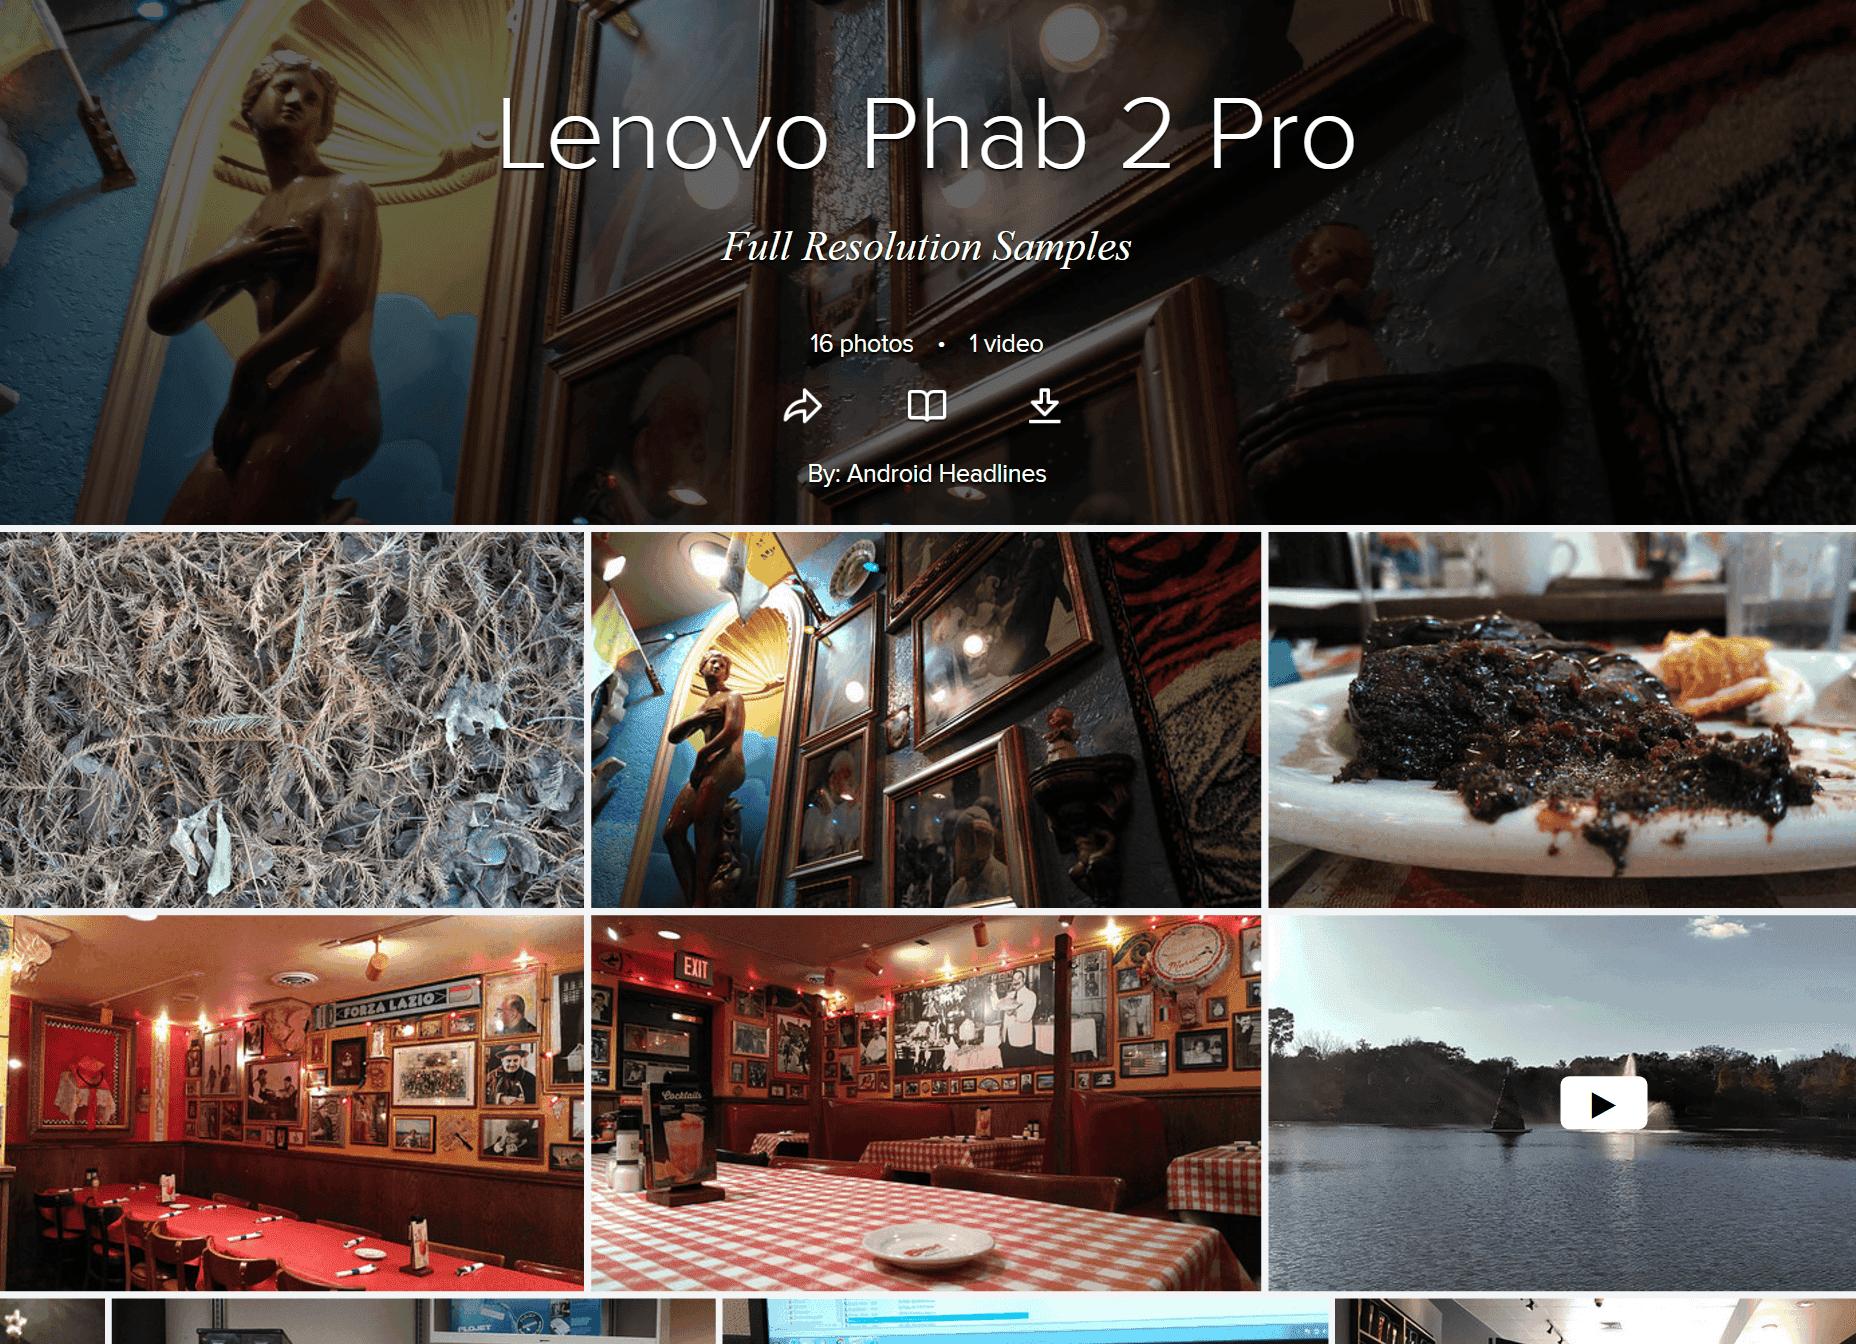 review lenovo phab 2 pro tango phone androidheadlines com